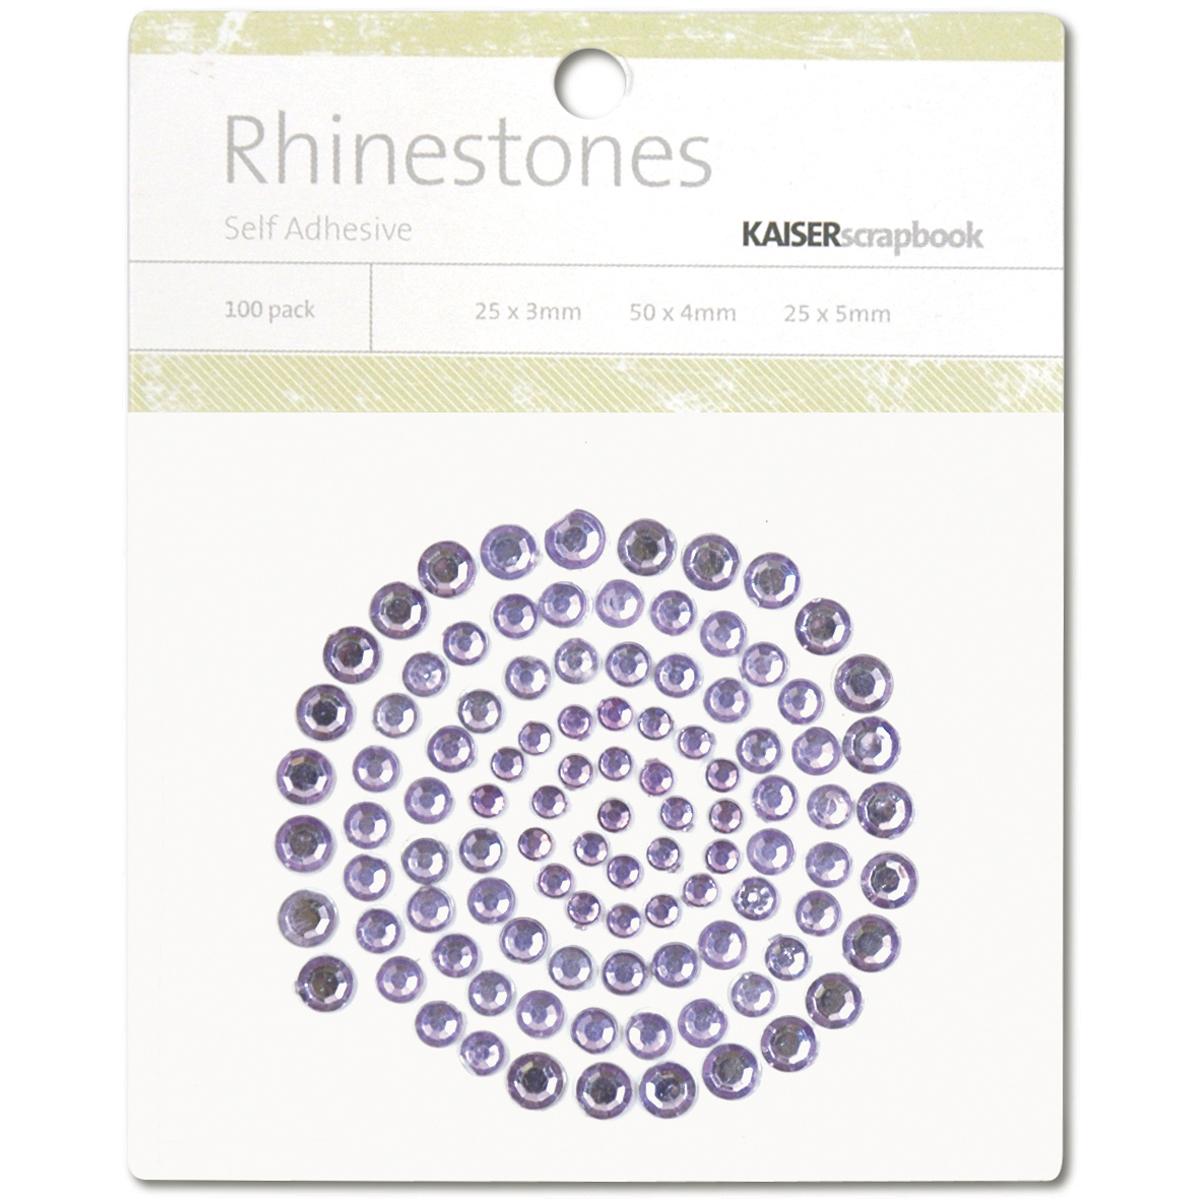 Self-Adhesive Rhinestones 100/Pkg-Lilac - image 1 of 1